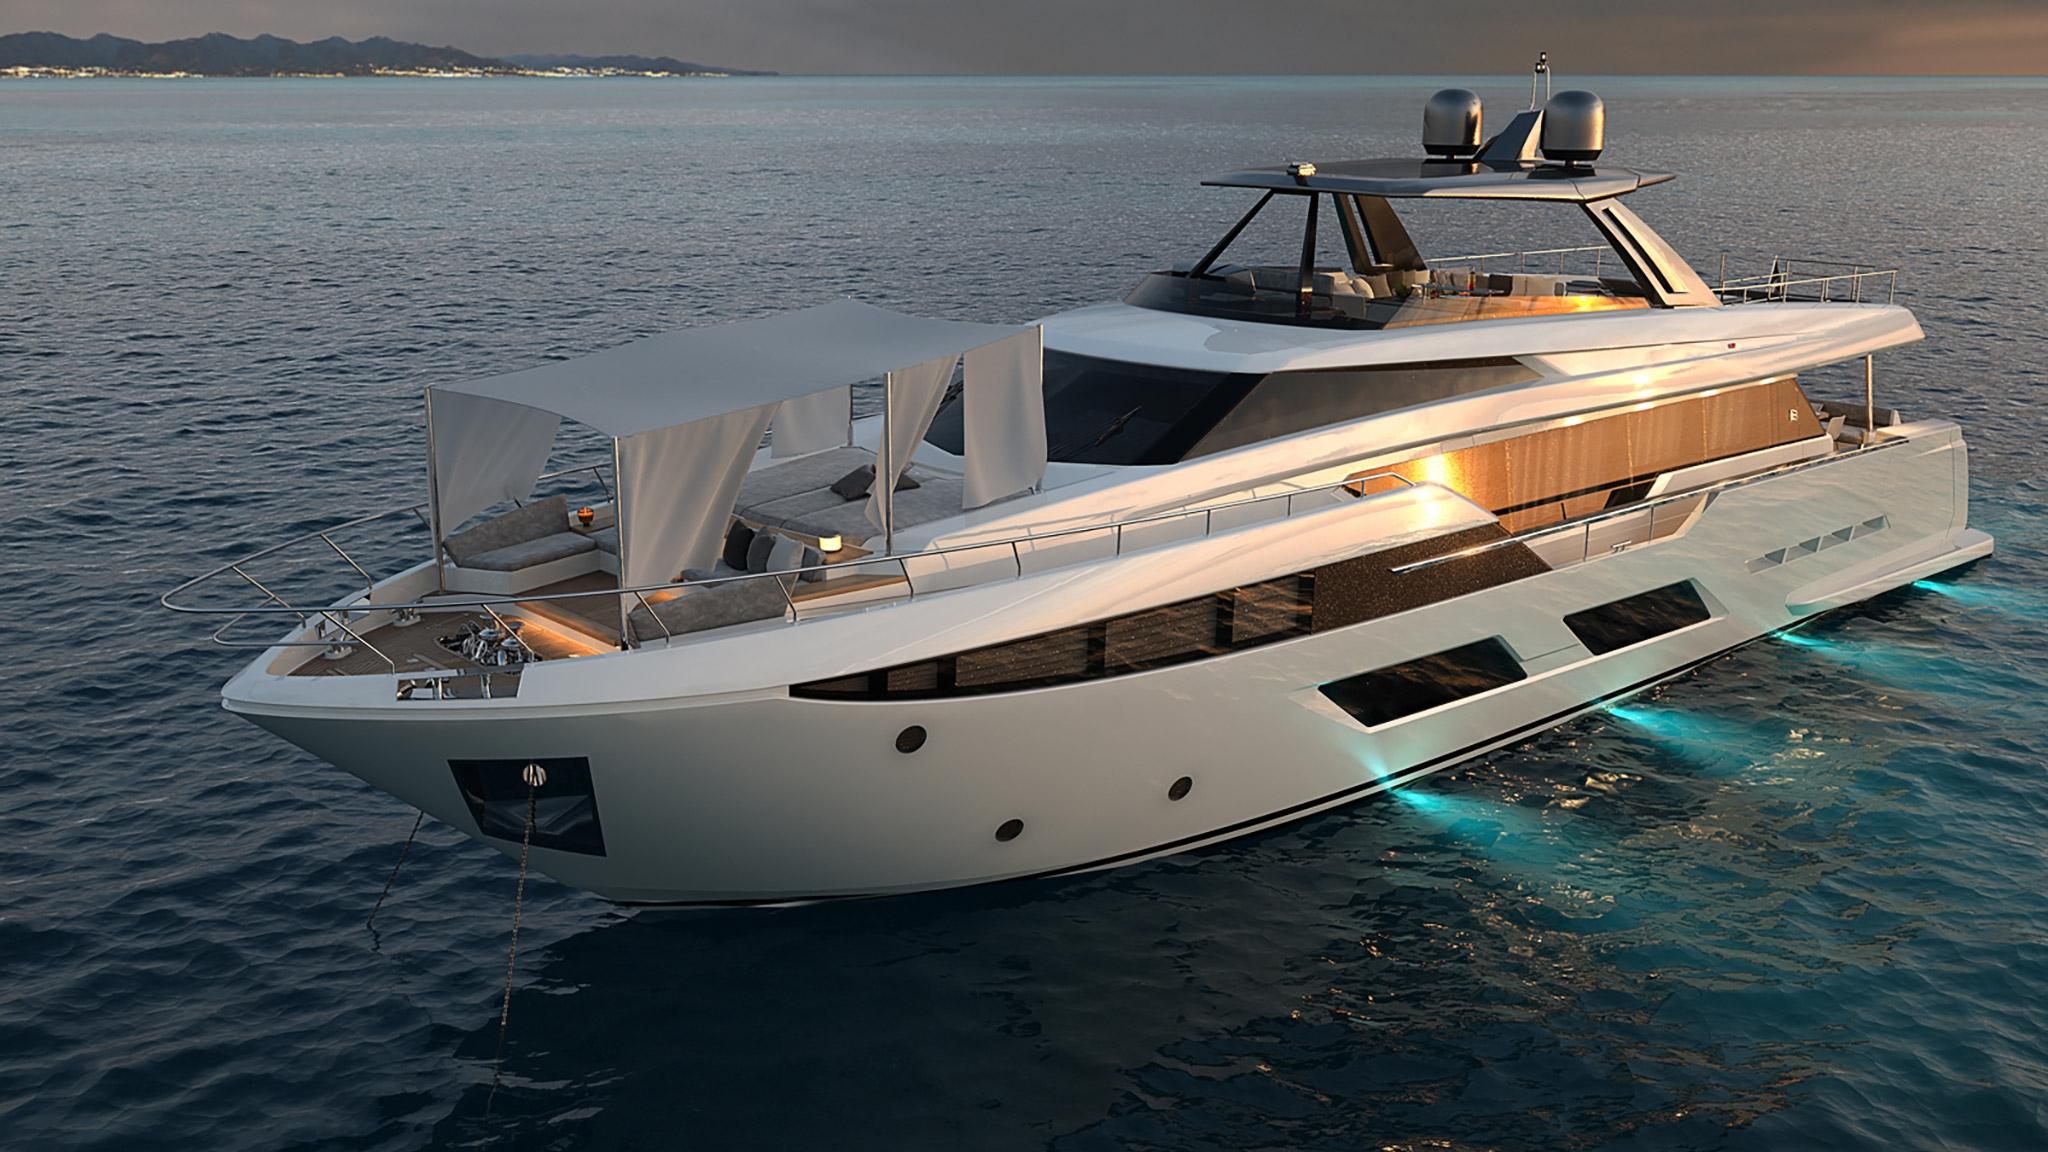 New Ferretti 920 - Ita Yachts Canada